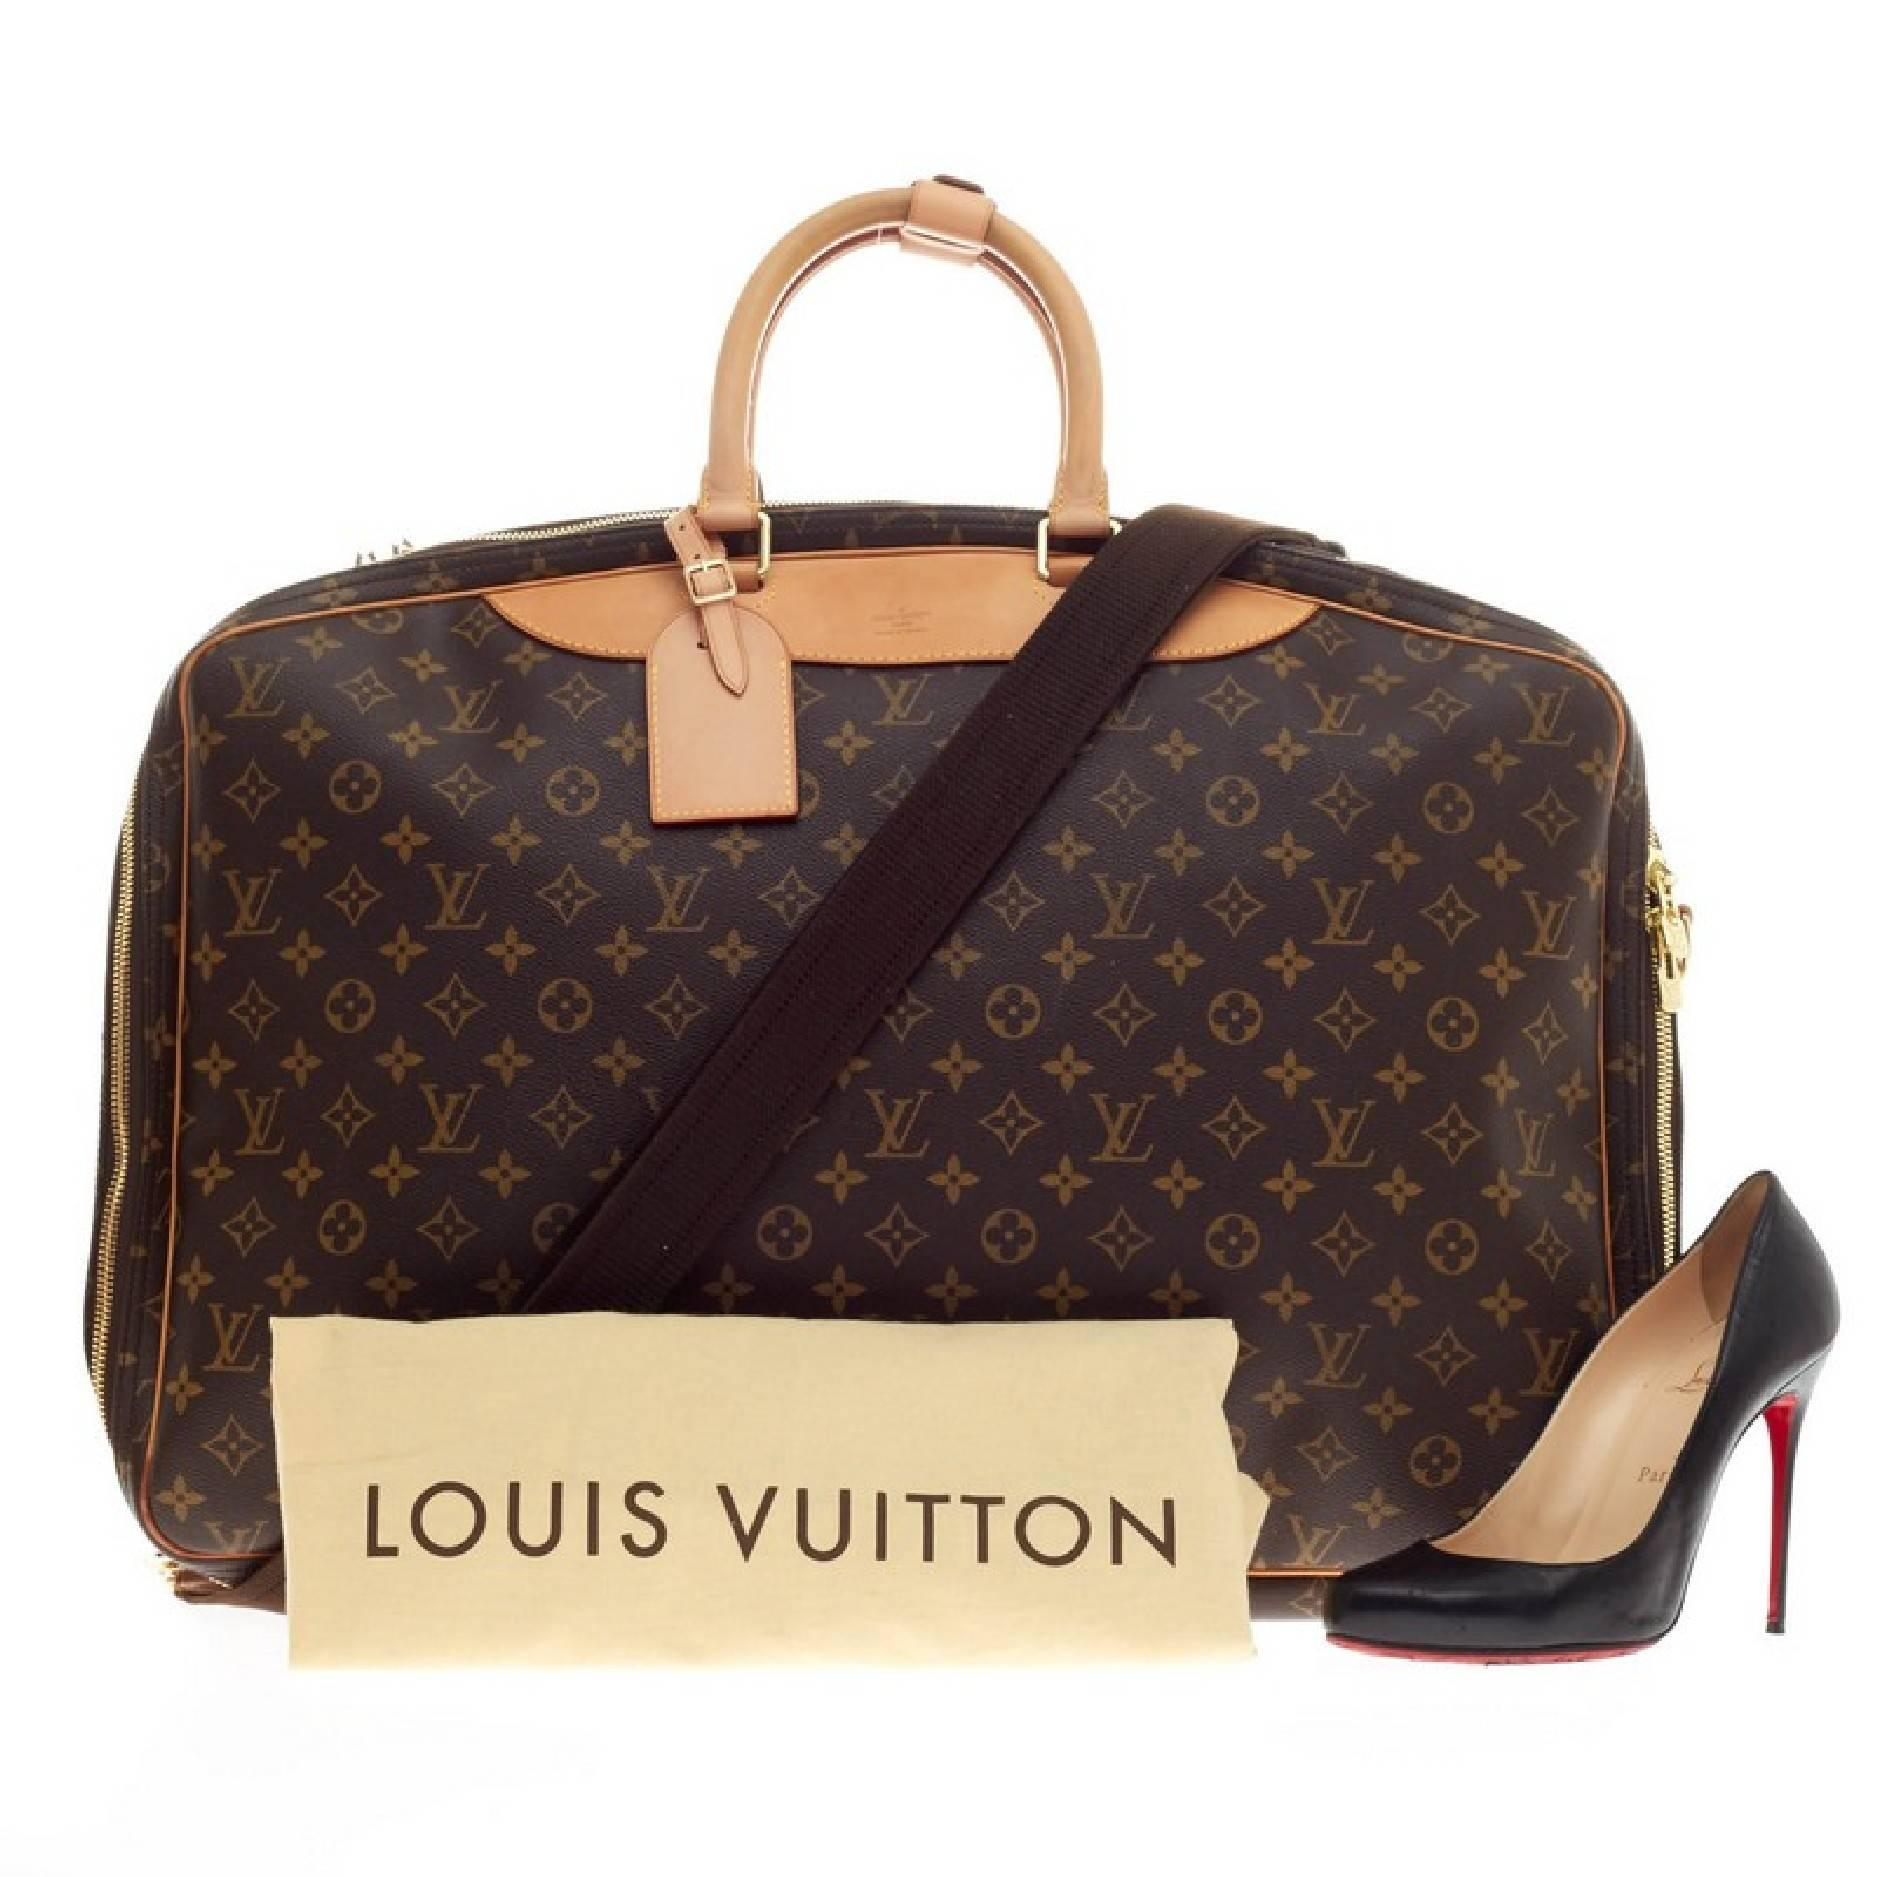 4abe95a758d2 Louis Vuitton Alize Travel Bag Monogram Canvas 2 Poches at 1stdibs